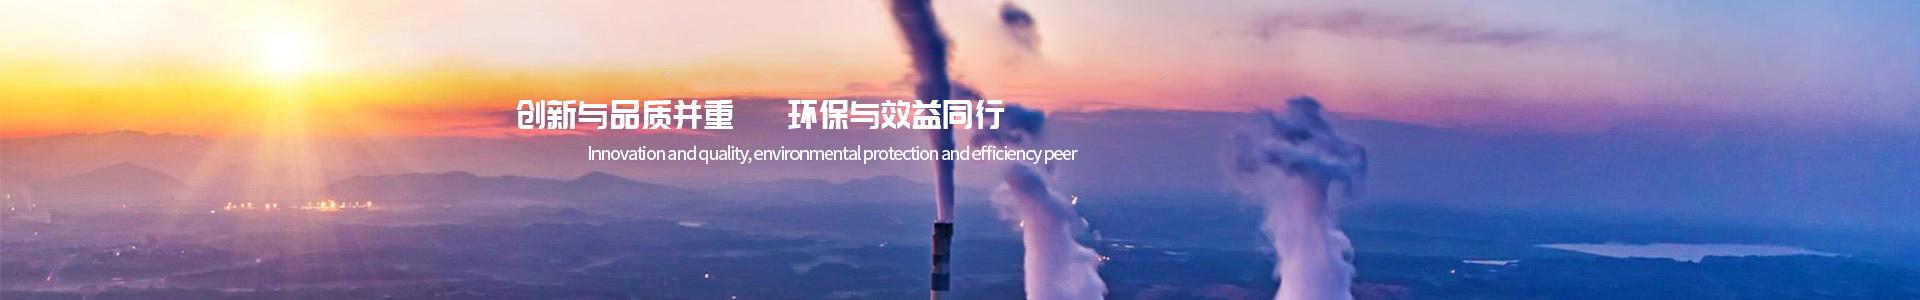 rco催化燃烧设备RCO催化燃烧设备,环保催化燃烧设备,废气催化燃烧设备